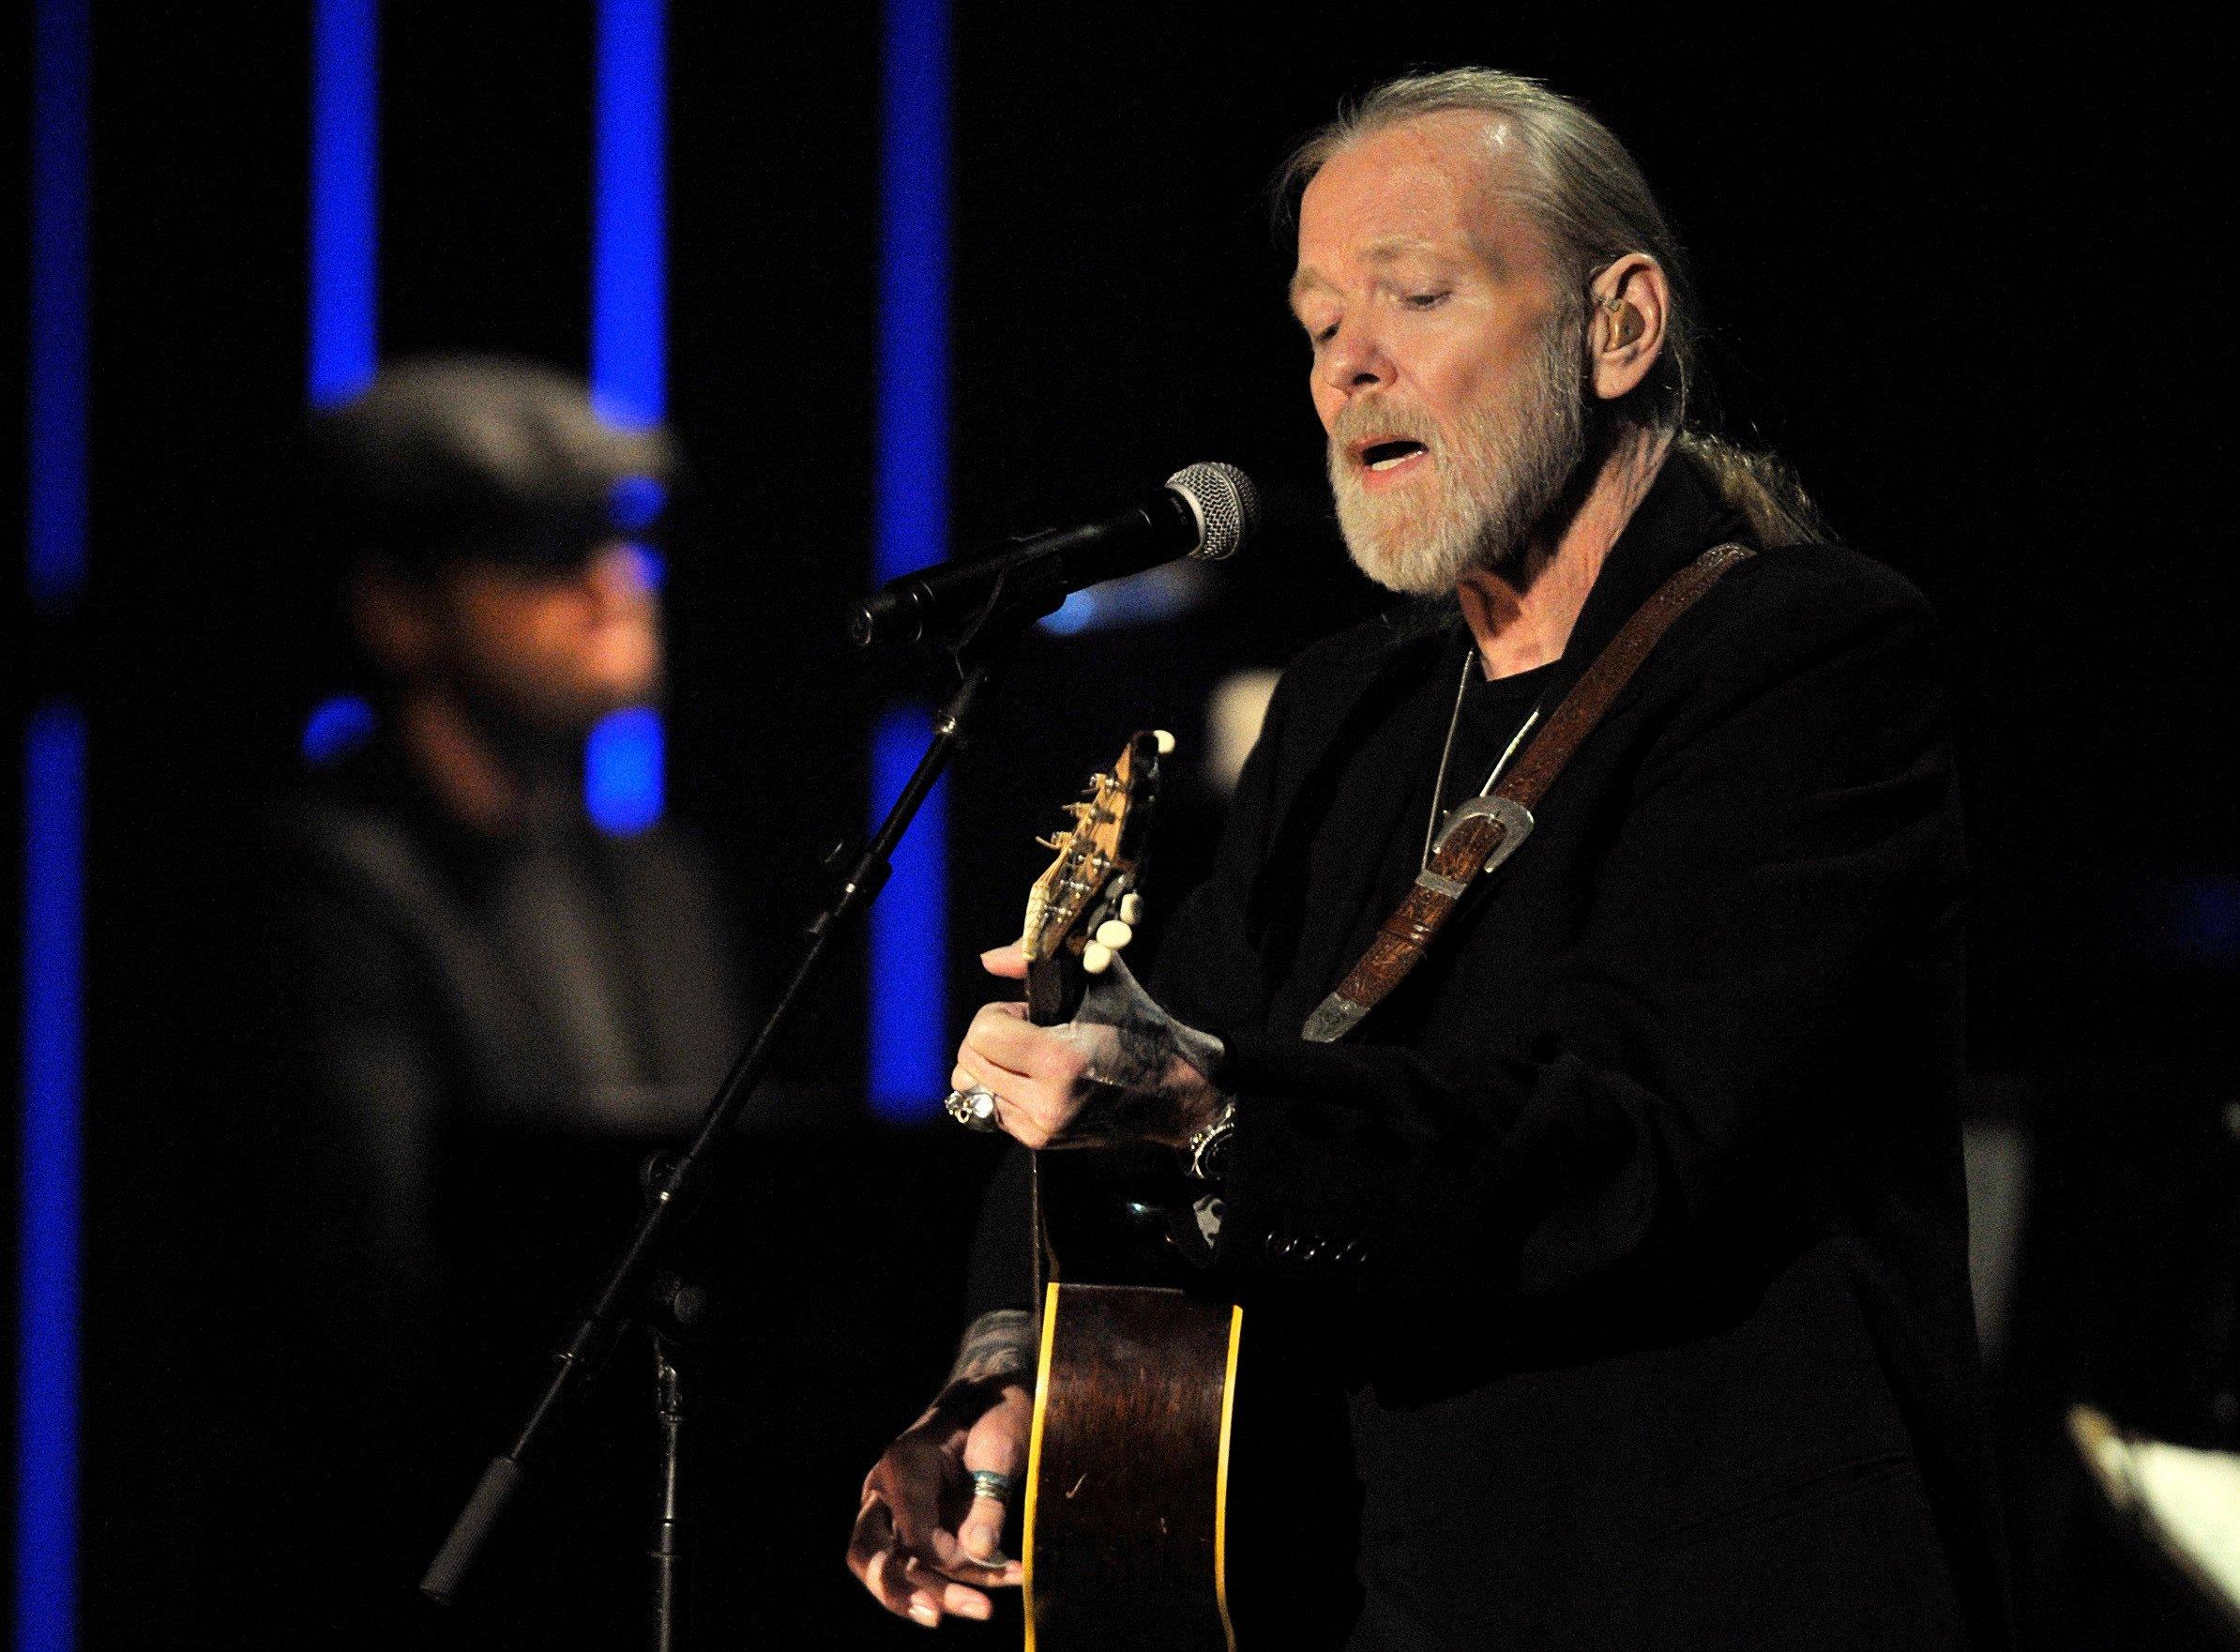 File photo shows Greg Allman performing at the Americana Music Association awards show in Nashville, Tenn. (AP Photo/Joe Howell, File)